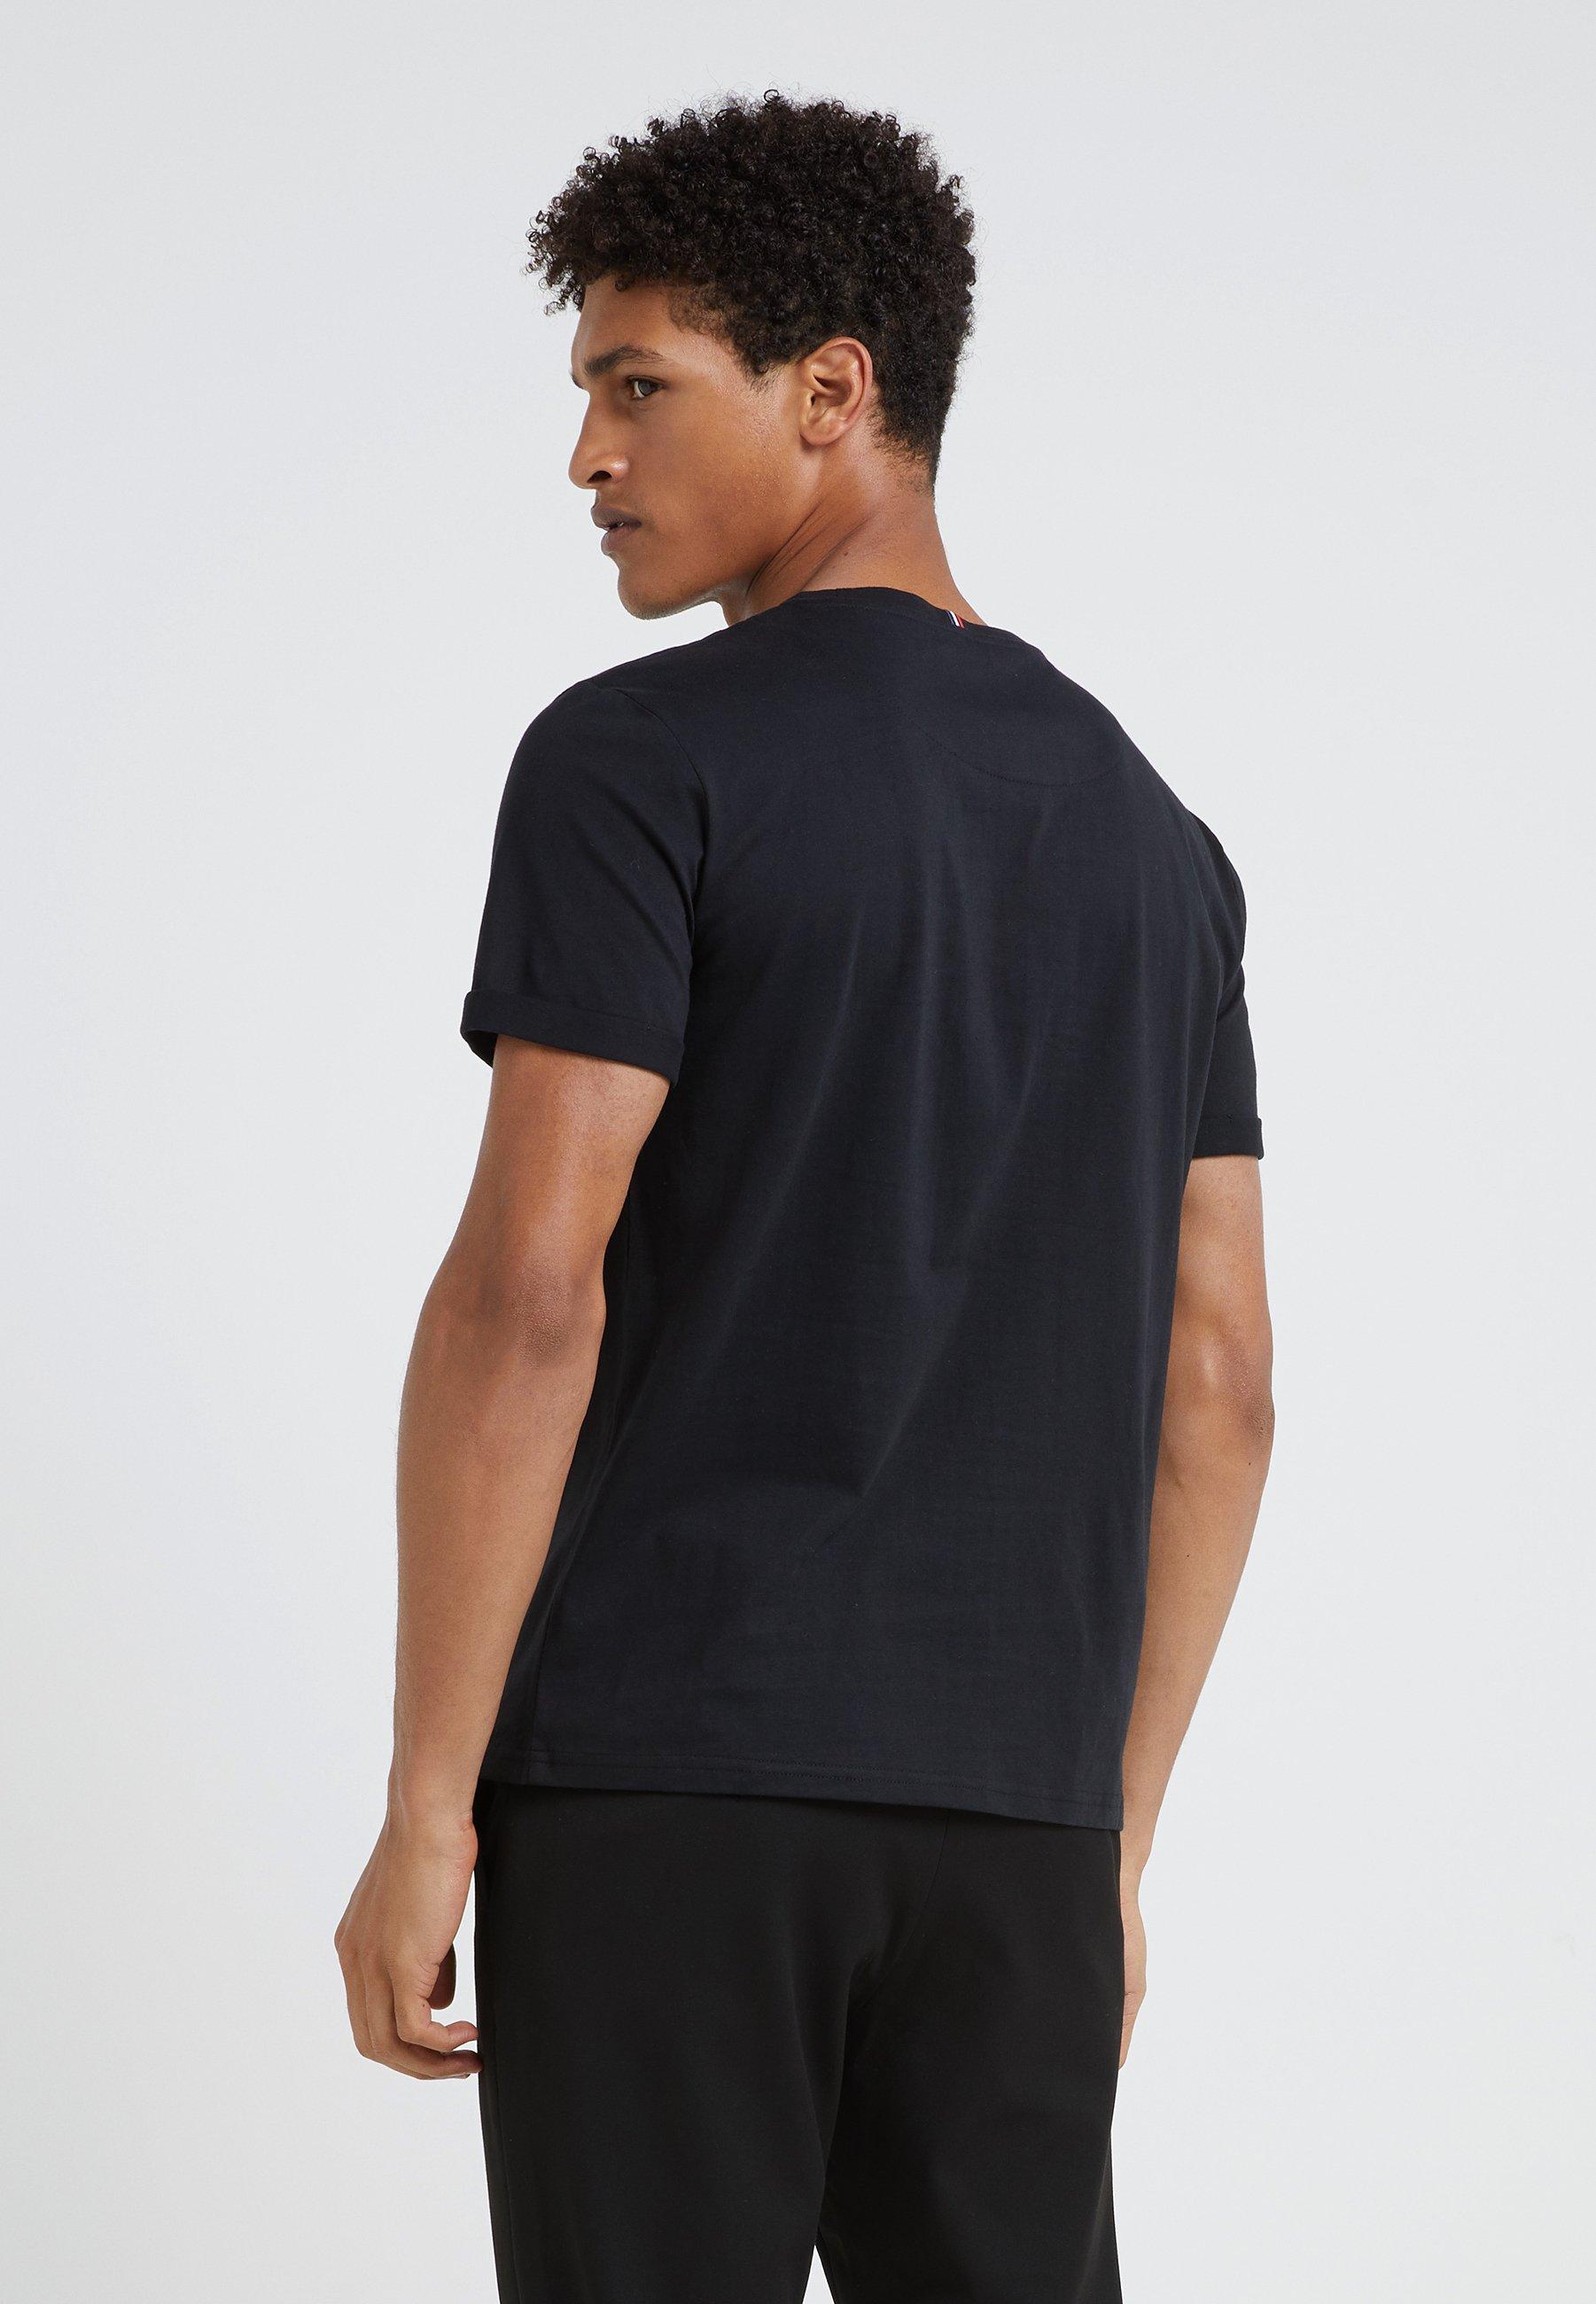 Les Deux Encore - T-shirts Med Print Black/svart